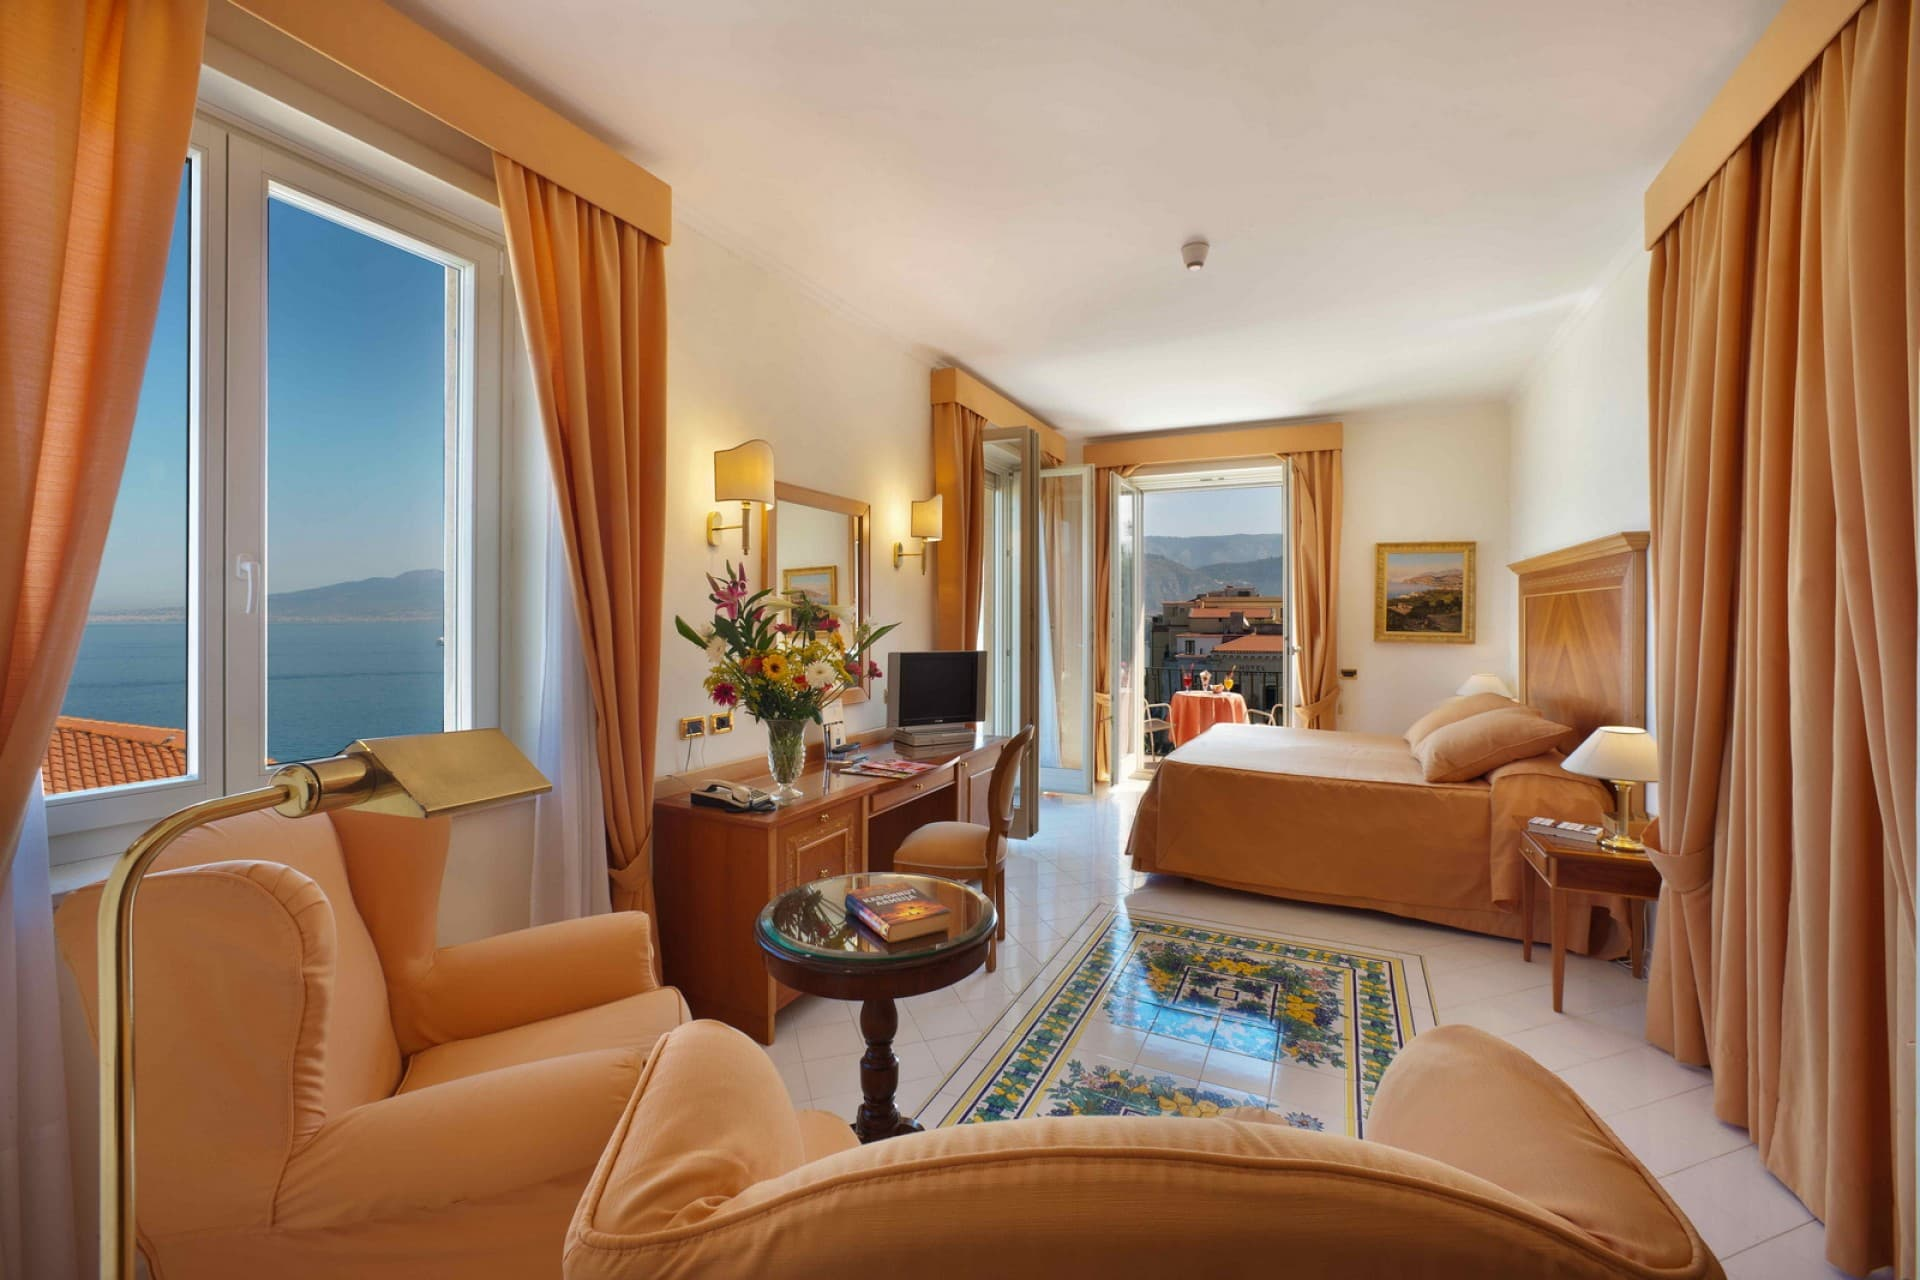 Byron junior suites hotel continental sorrento for Terrazza vittoria sorrento